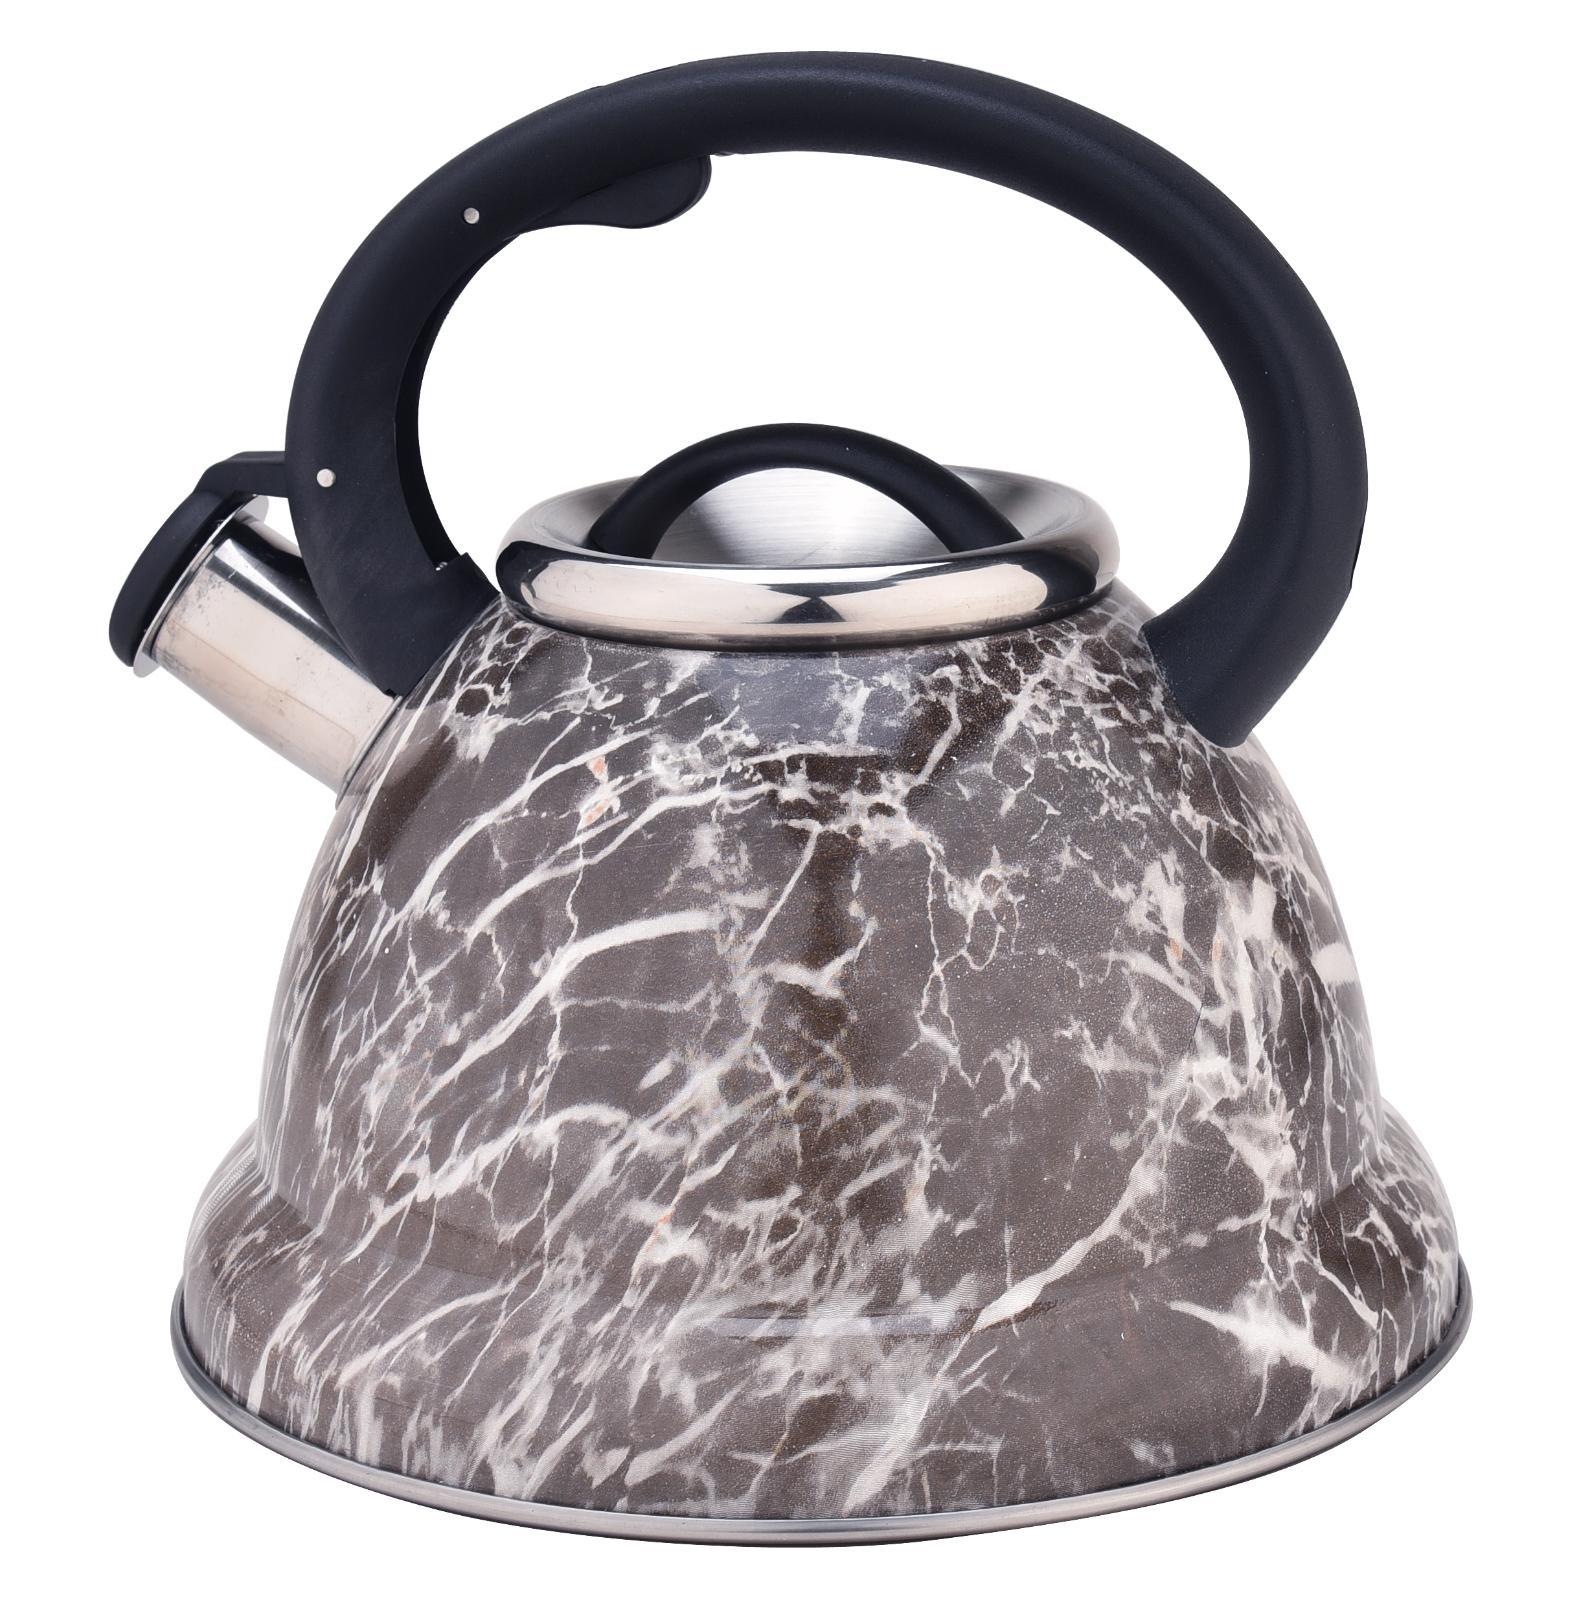 Stovetop Stainless Whistling Tea Kettle Pot